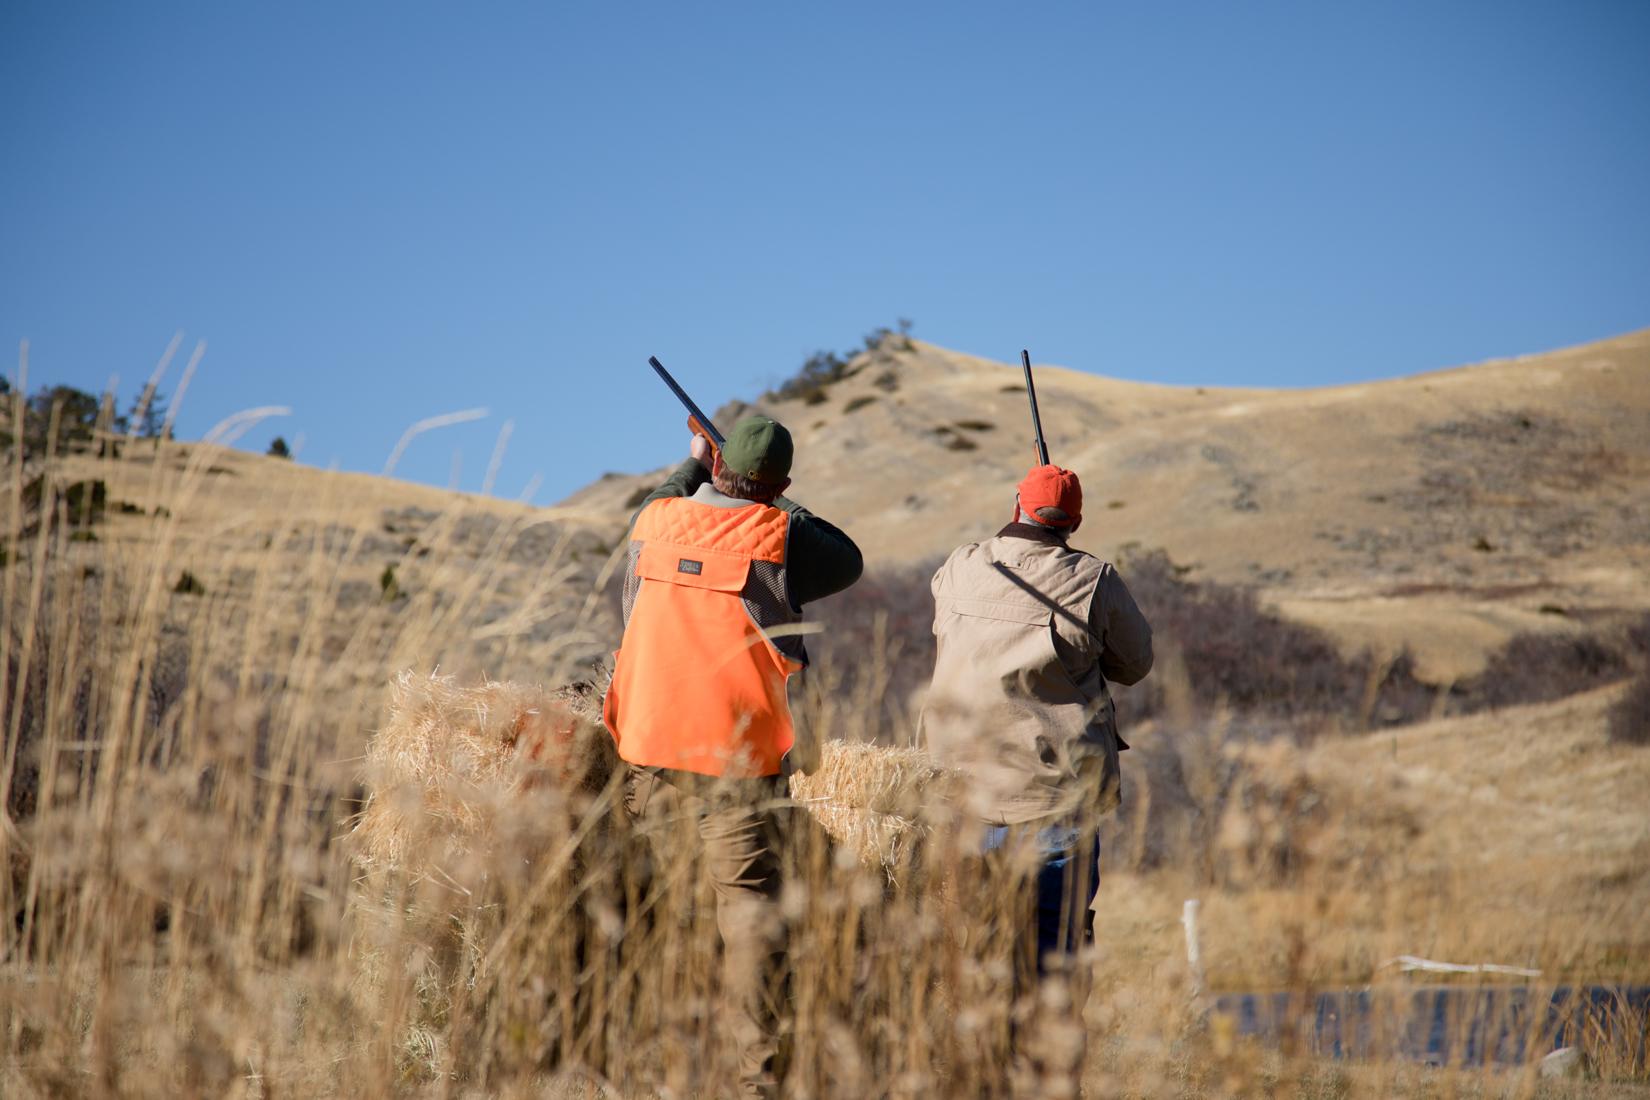 Best place to bird hunt in Montana